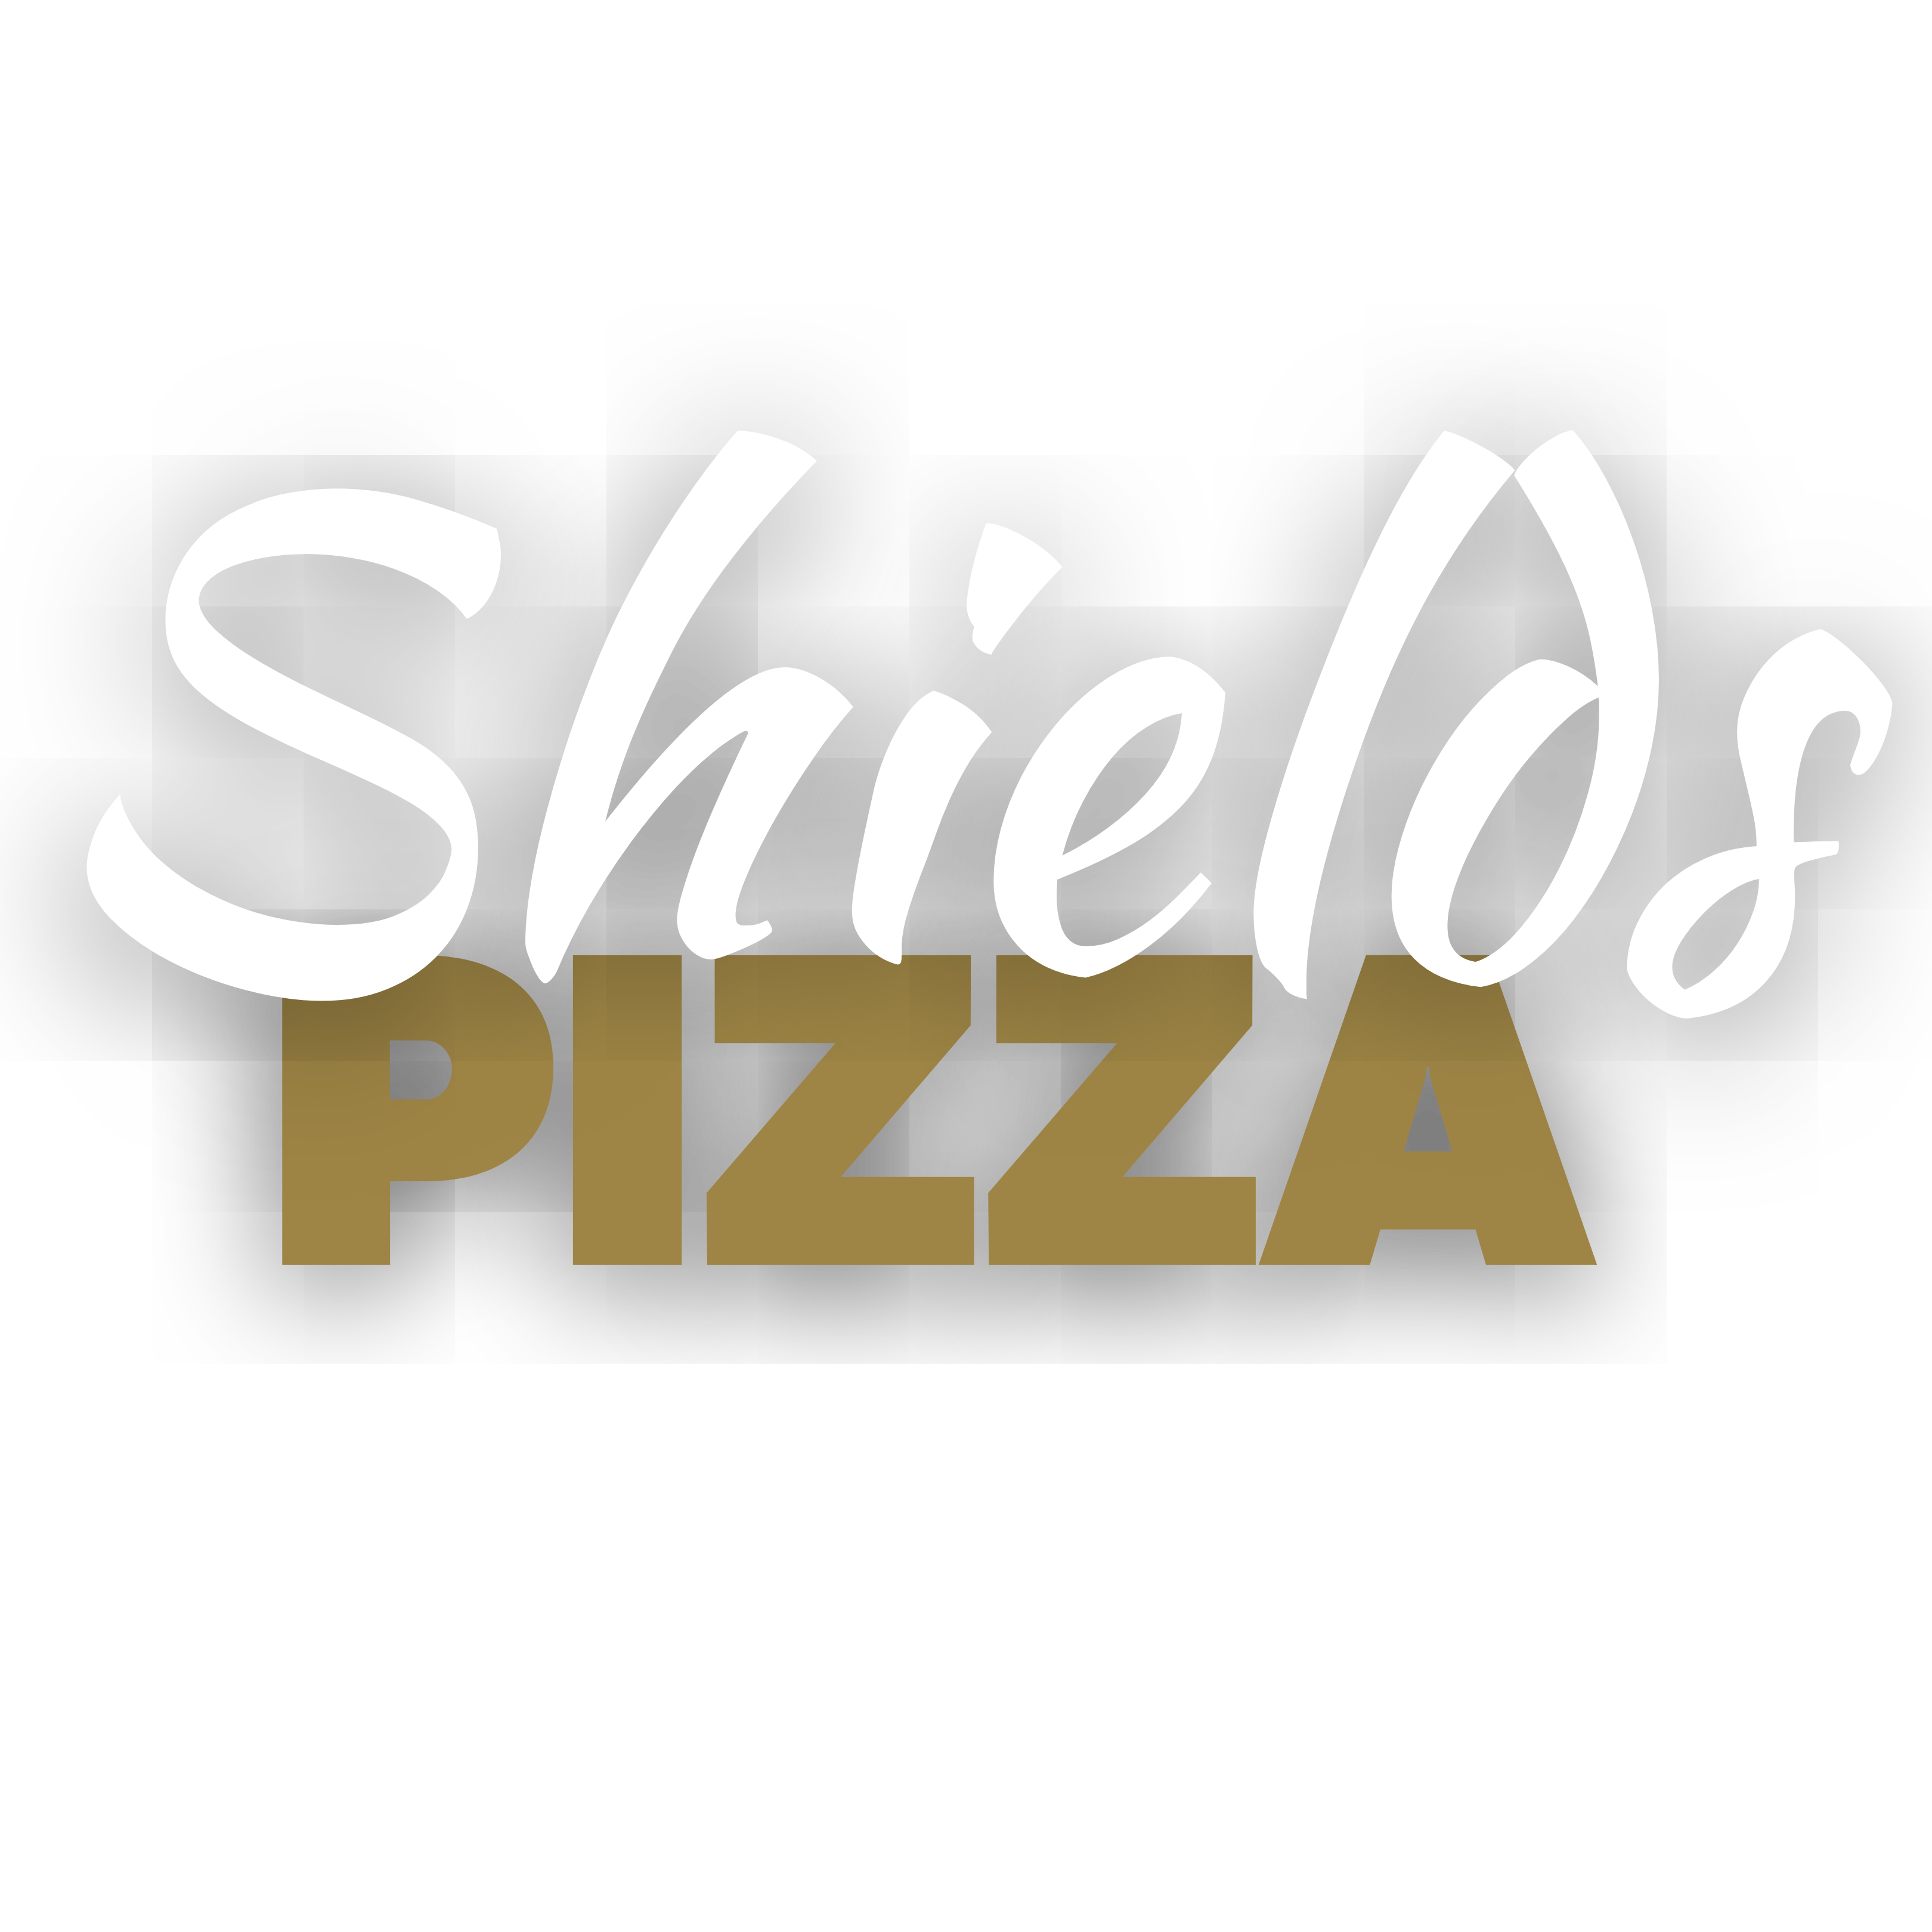 Shields Pizza Logo